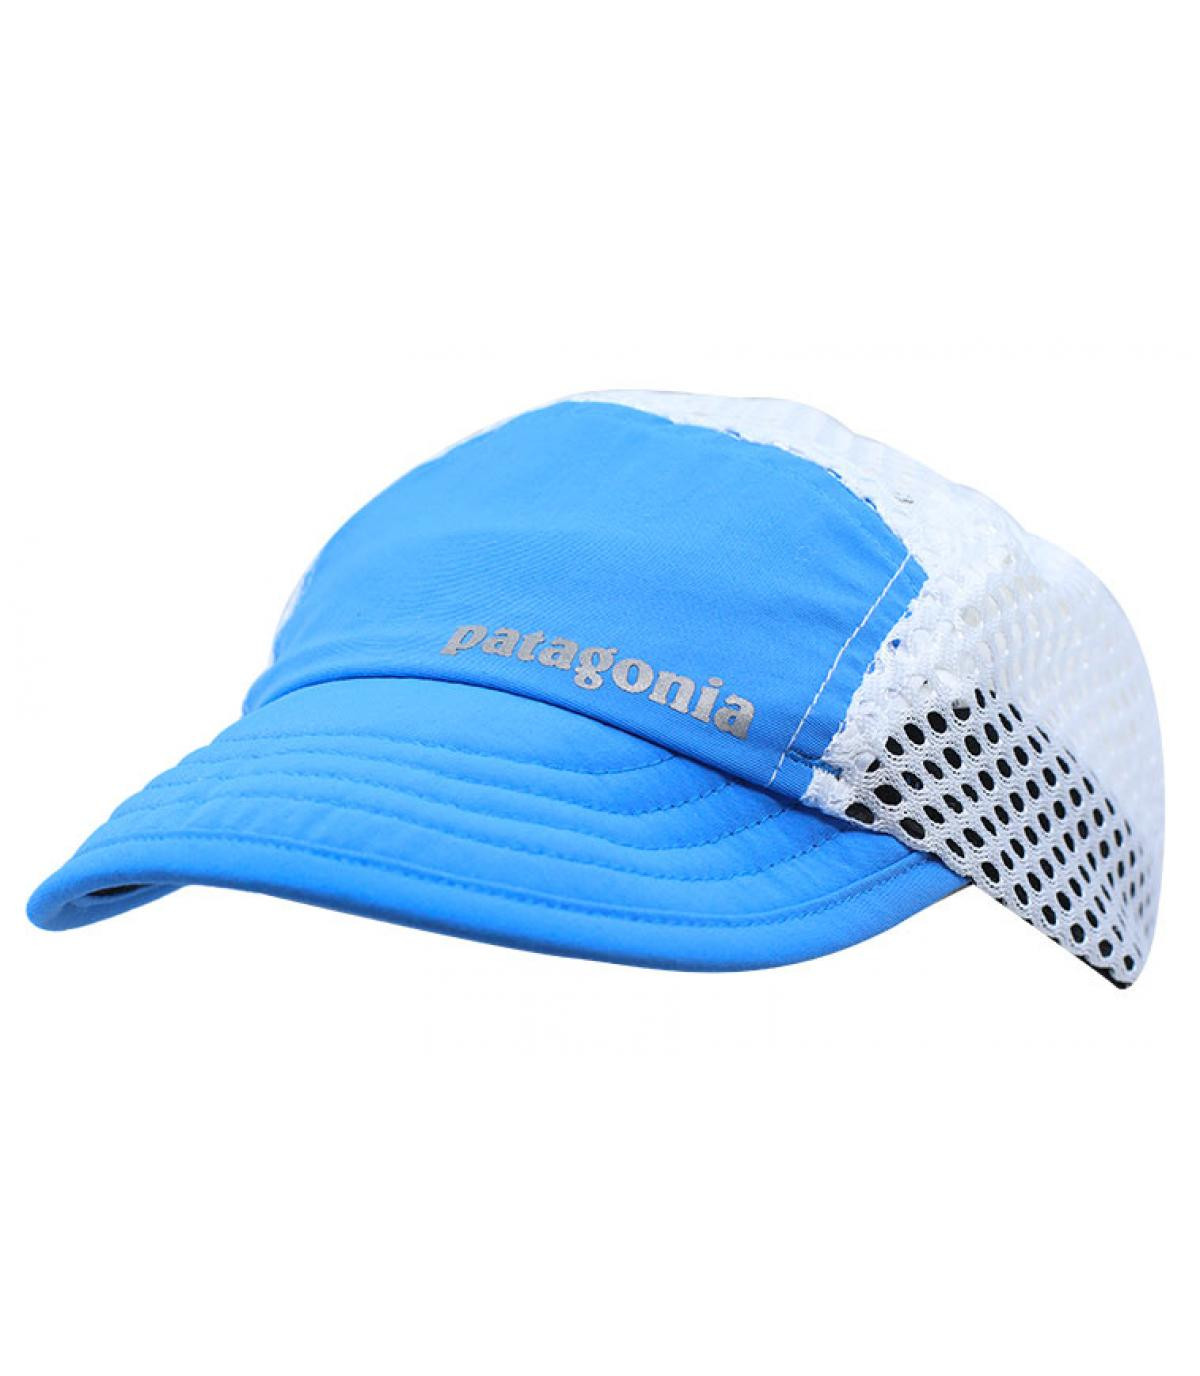 casquette running Patagonia bleu